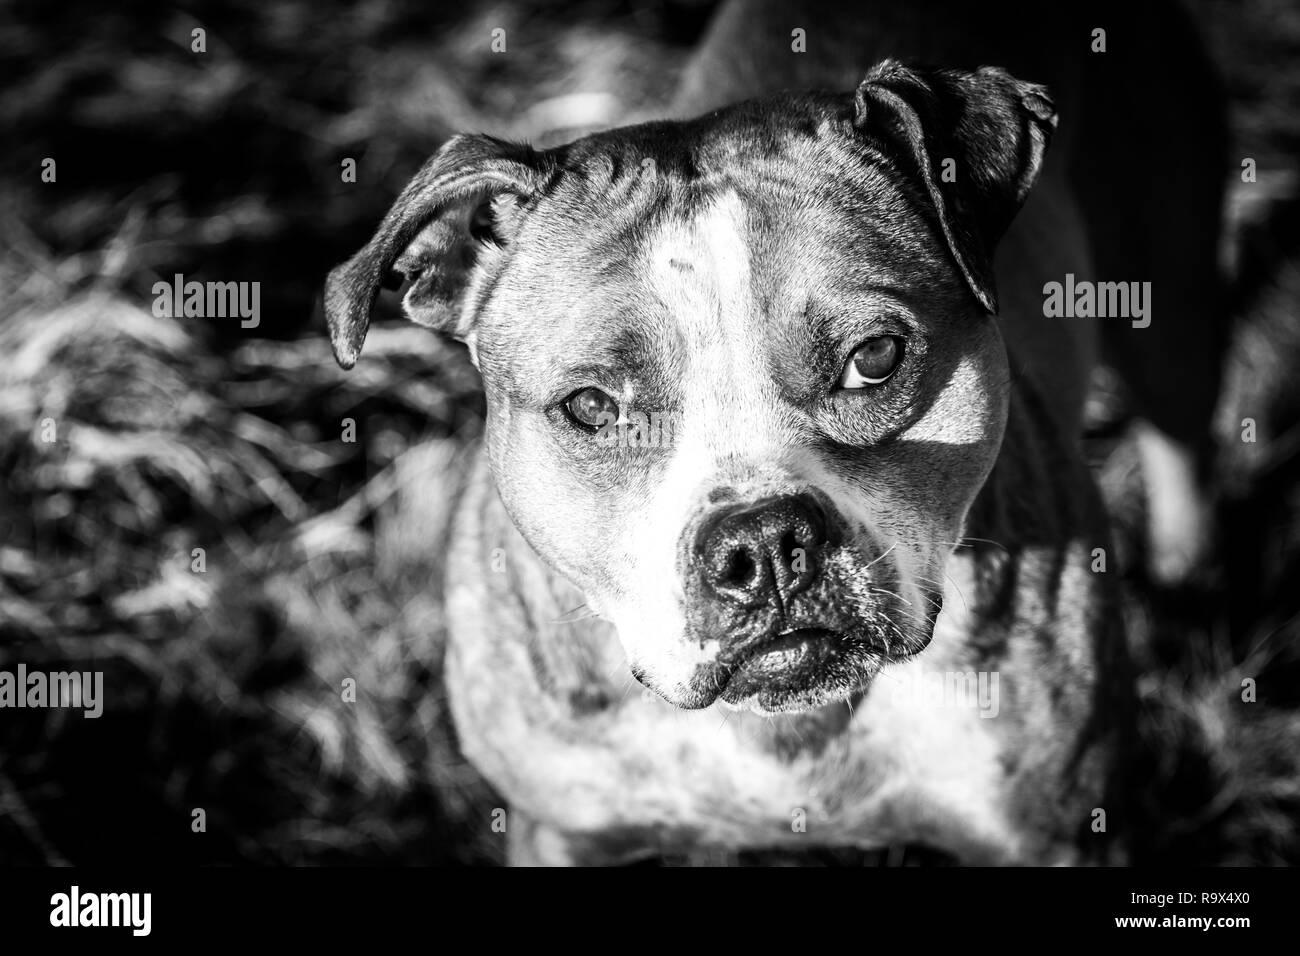 Male American Pit Bull Terrier in black & white portrait - Stock Image